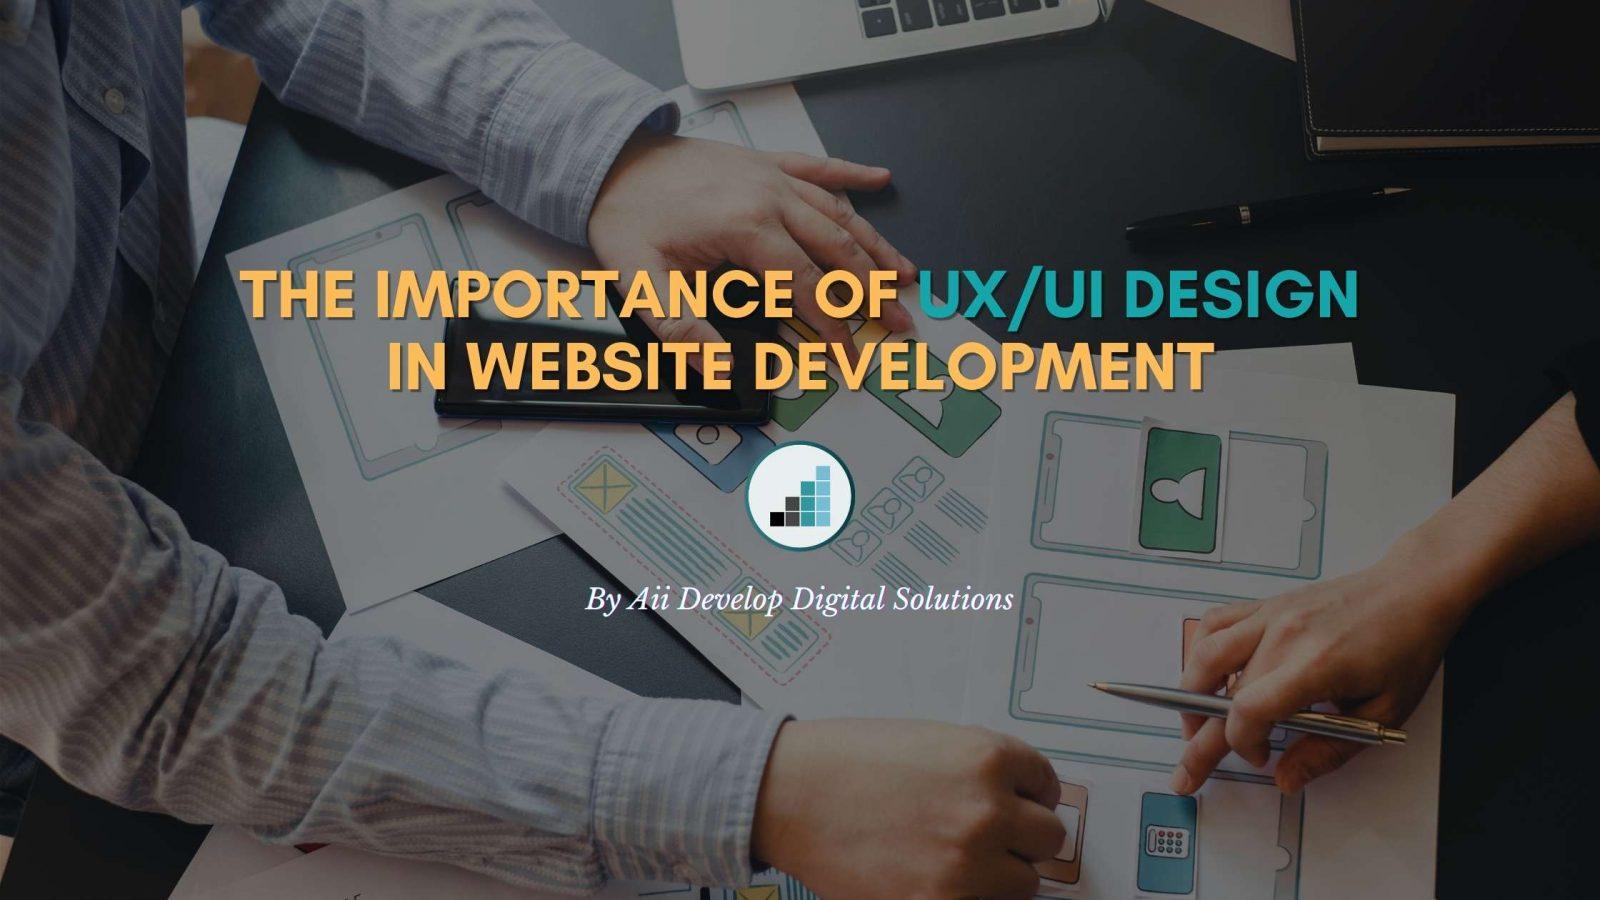 Importance of UX/UI Design in Website Development